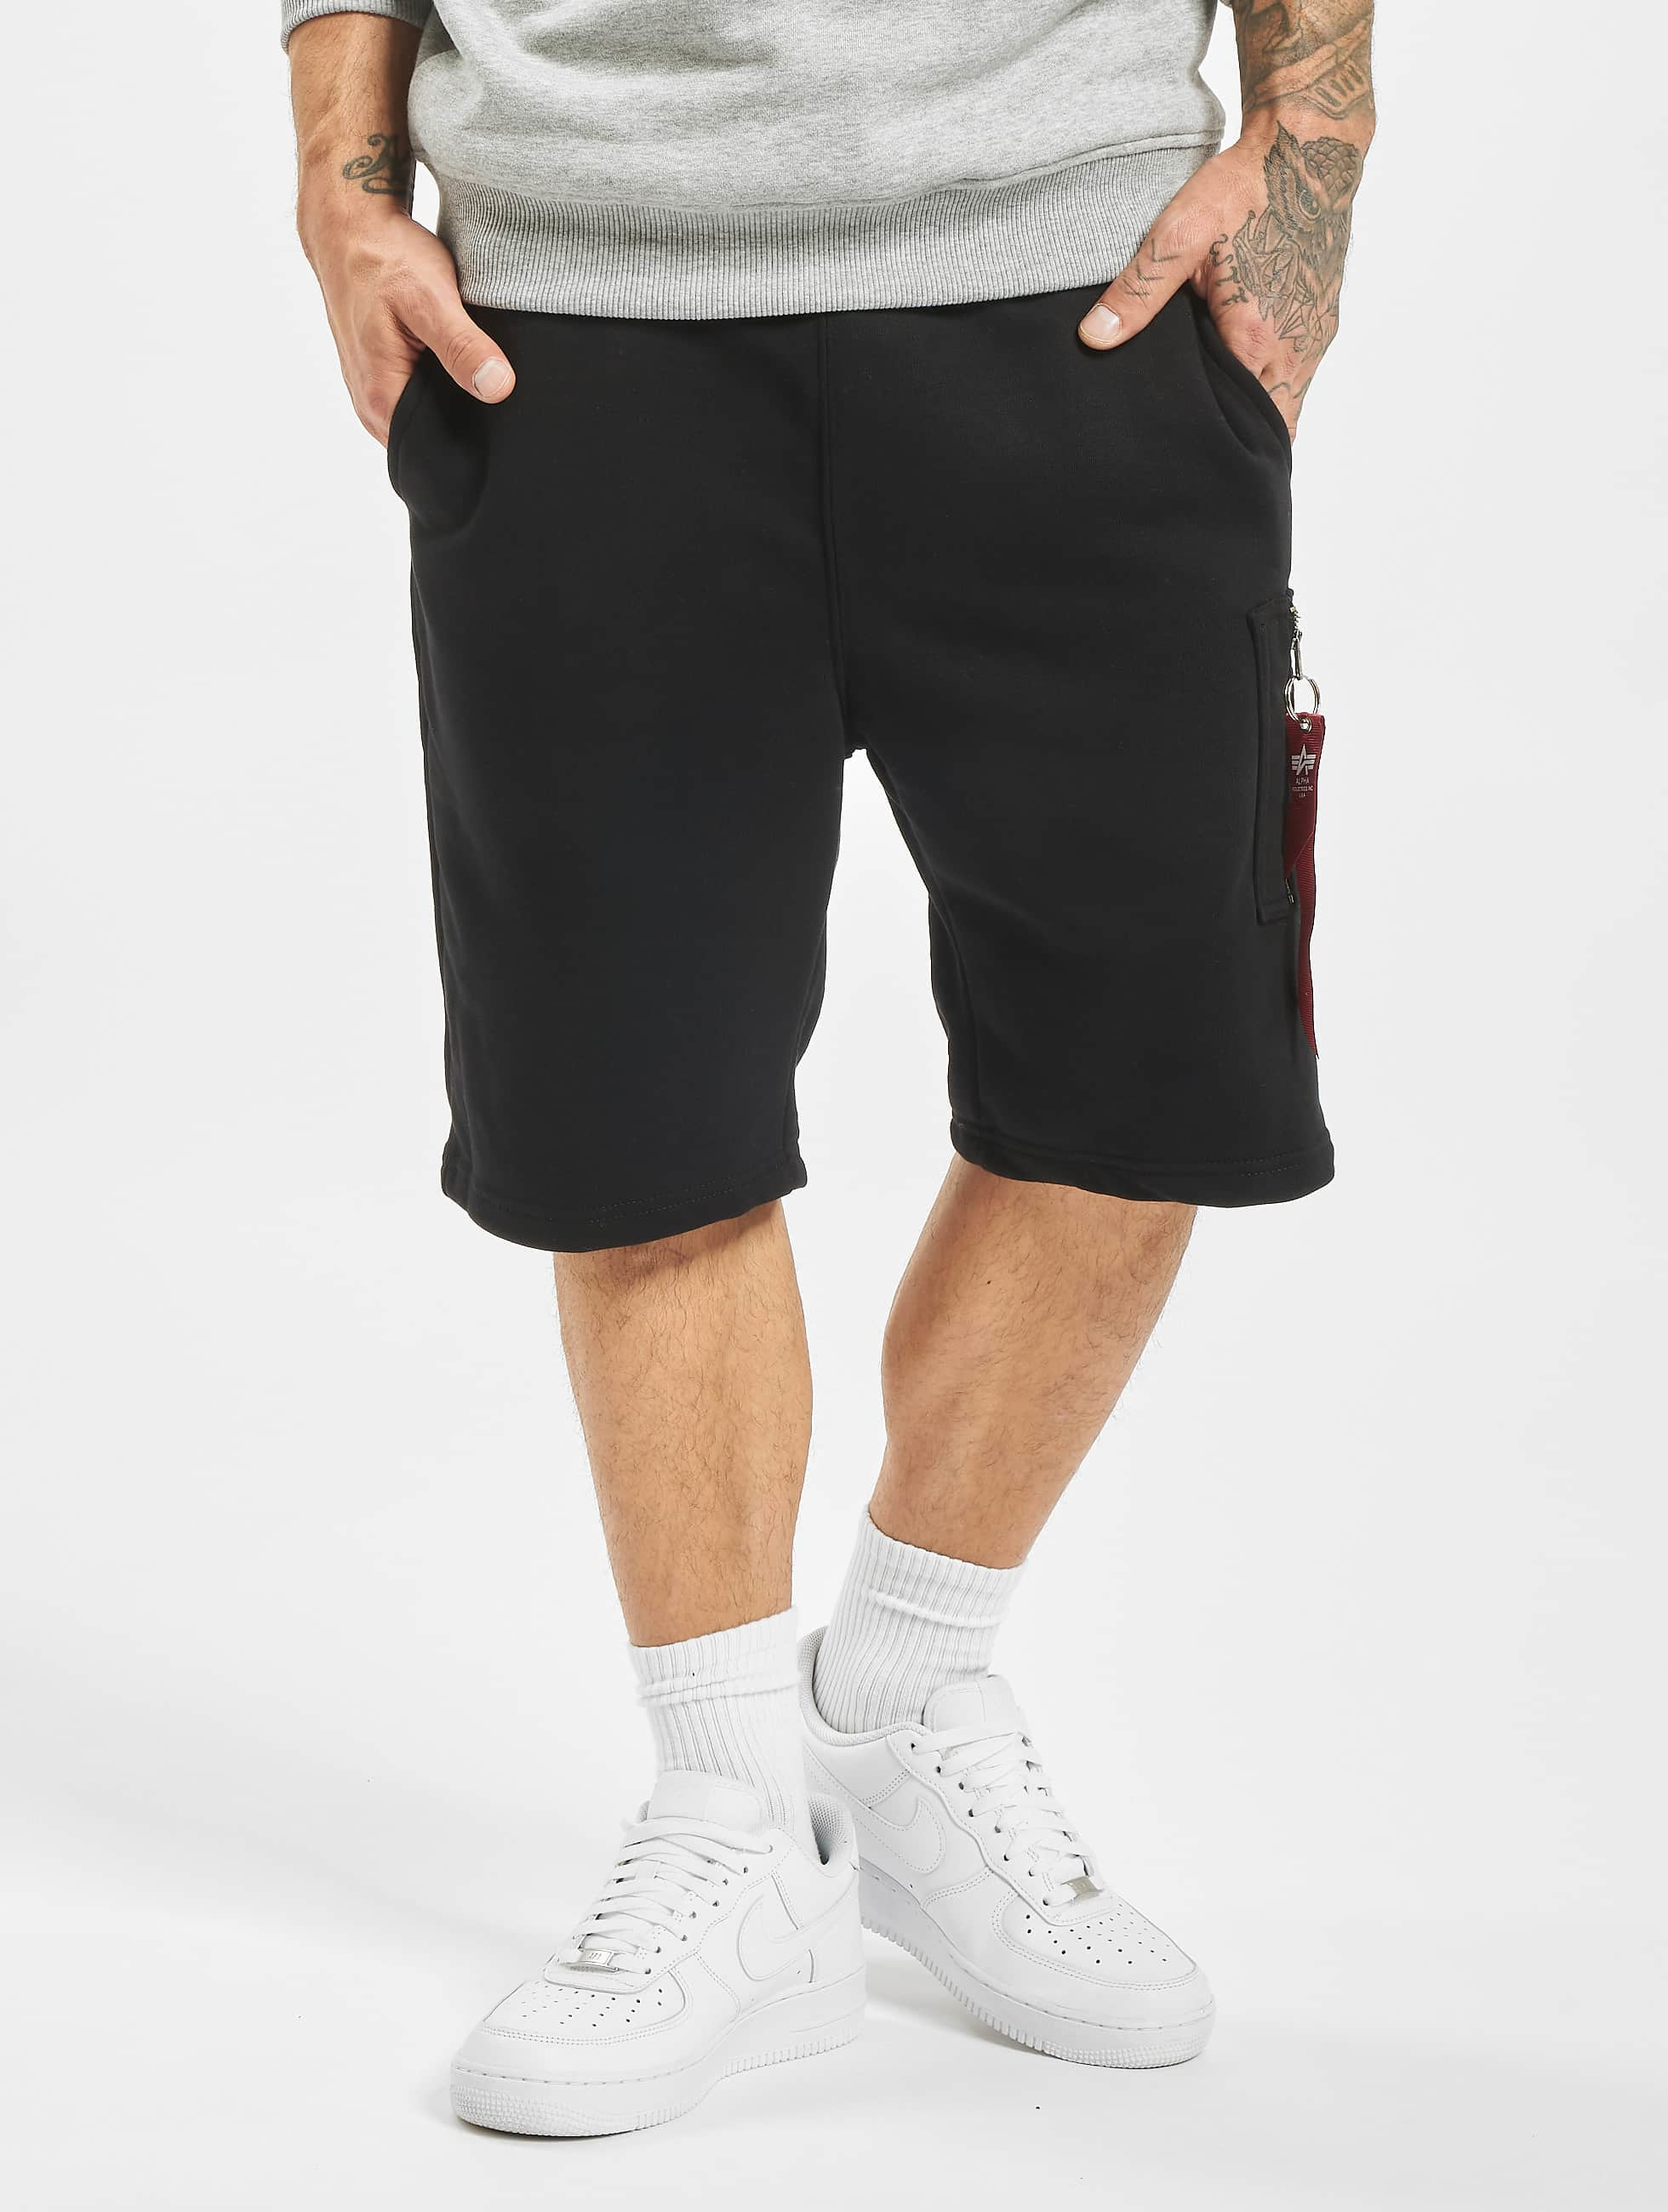 Alpha-Industries-Uomini-Pantaloni-Shorts-X-Fit-Cargo